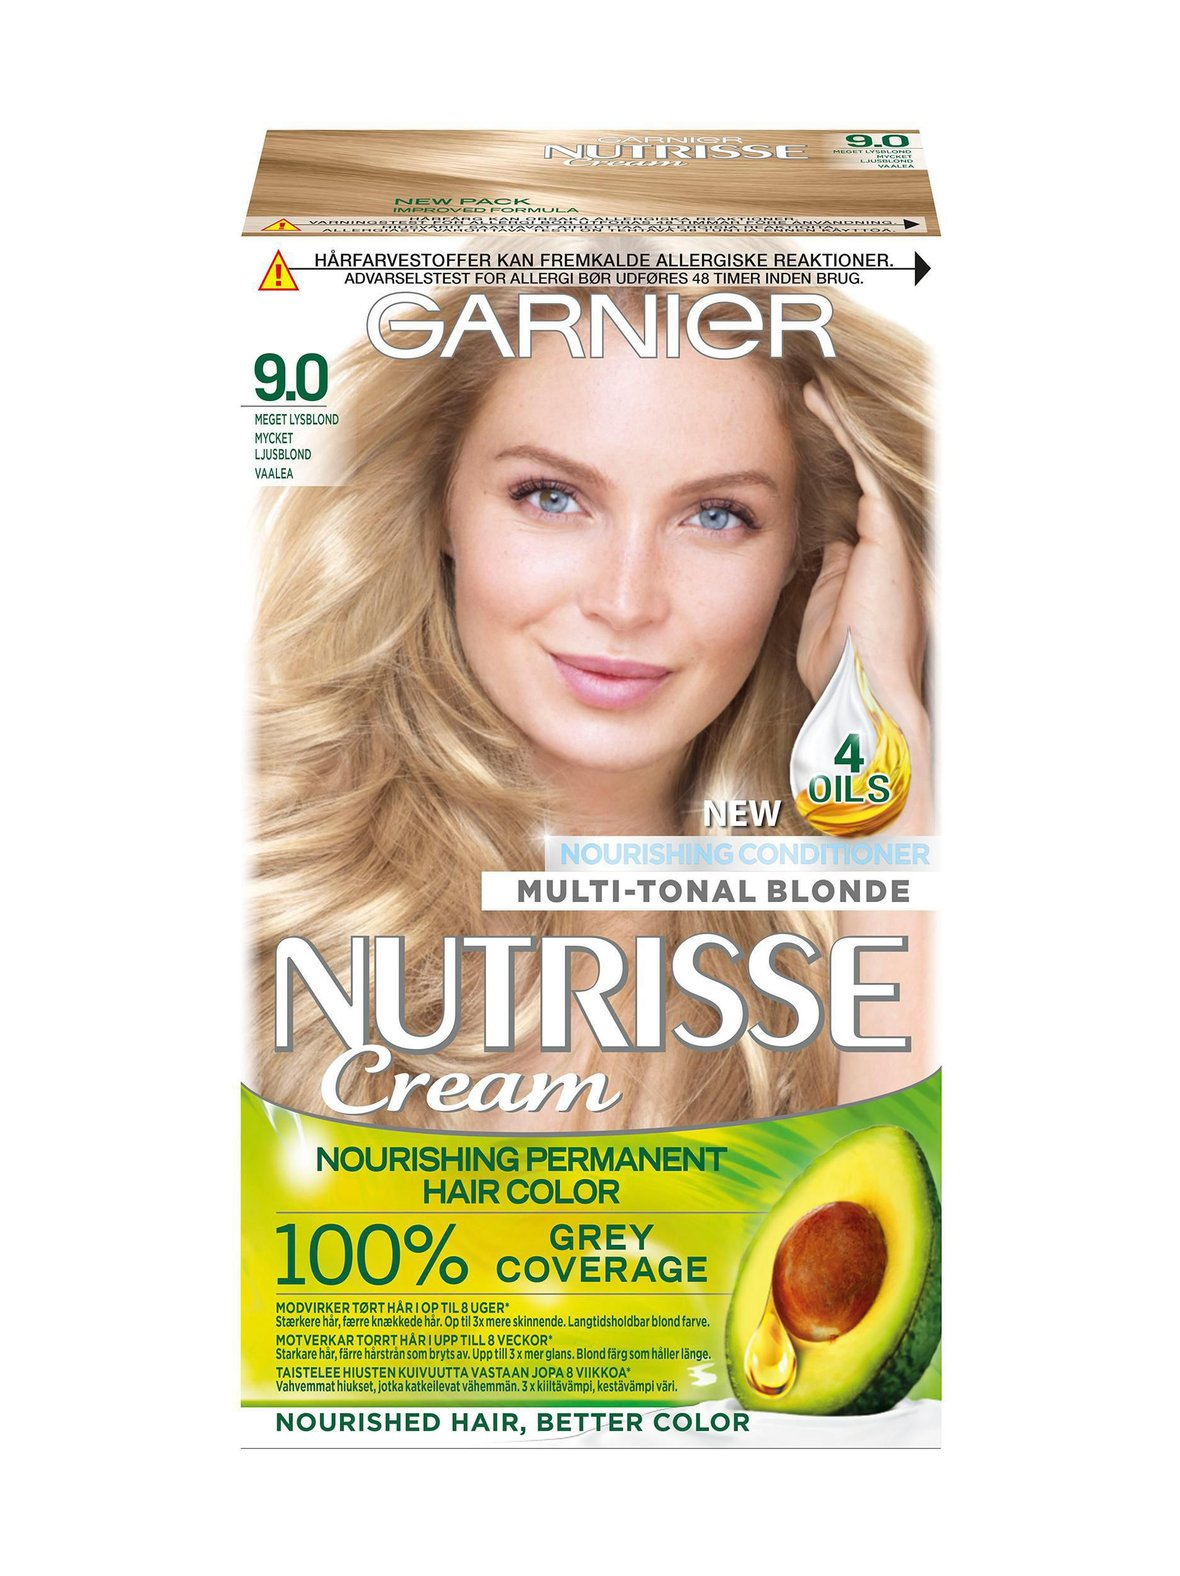 9 Vaalea Garnier Nutrisse Cream -kestoväri  1549b6178d